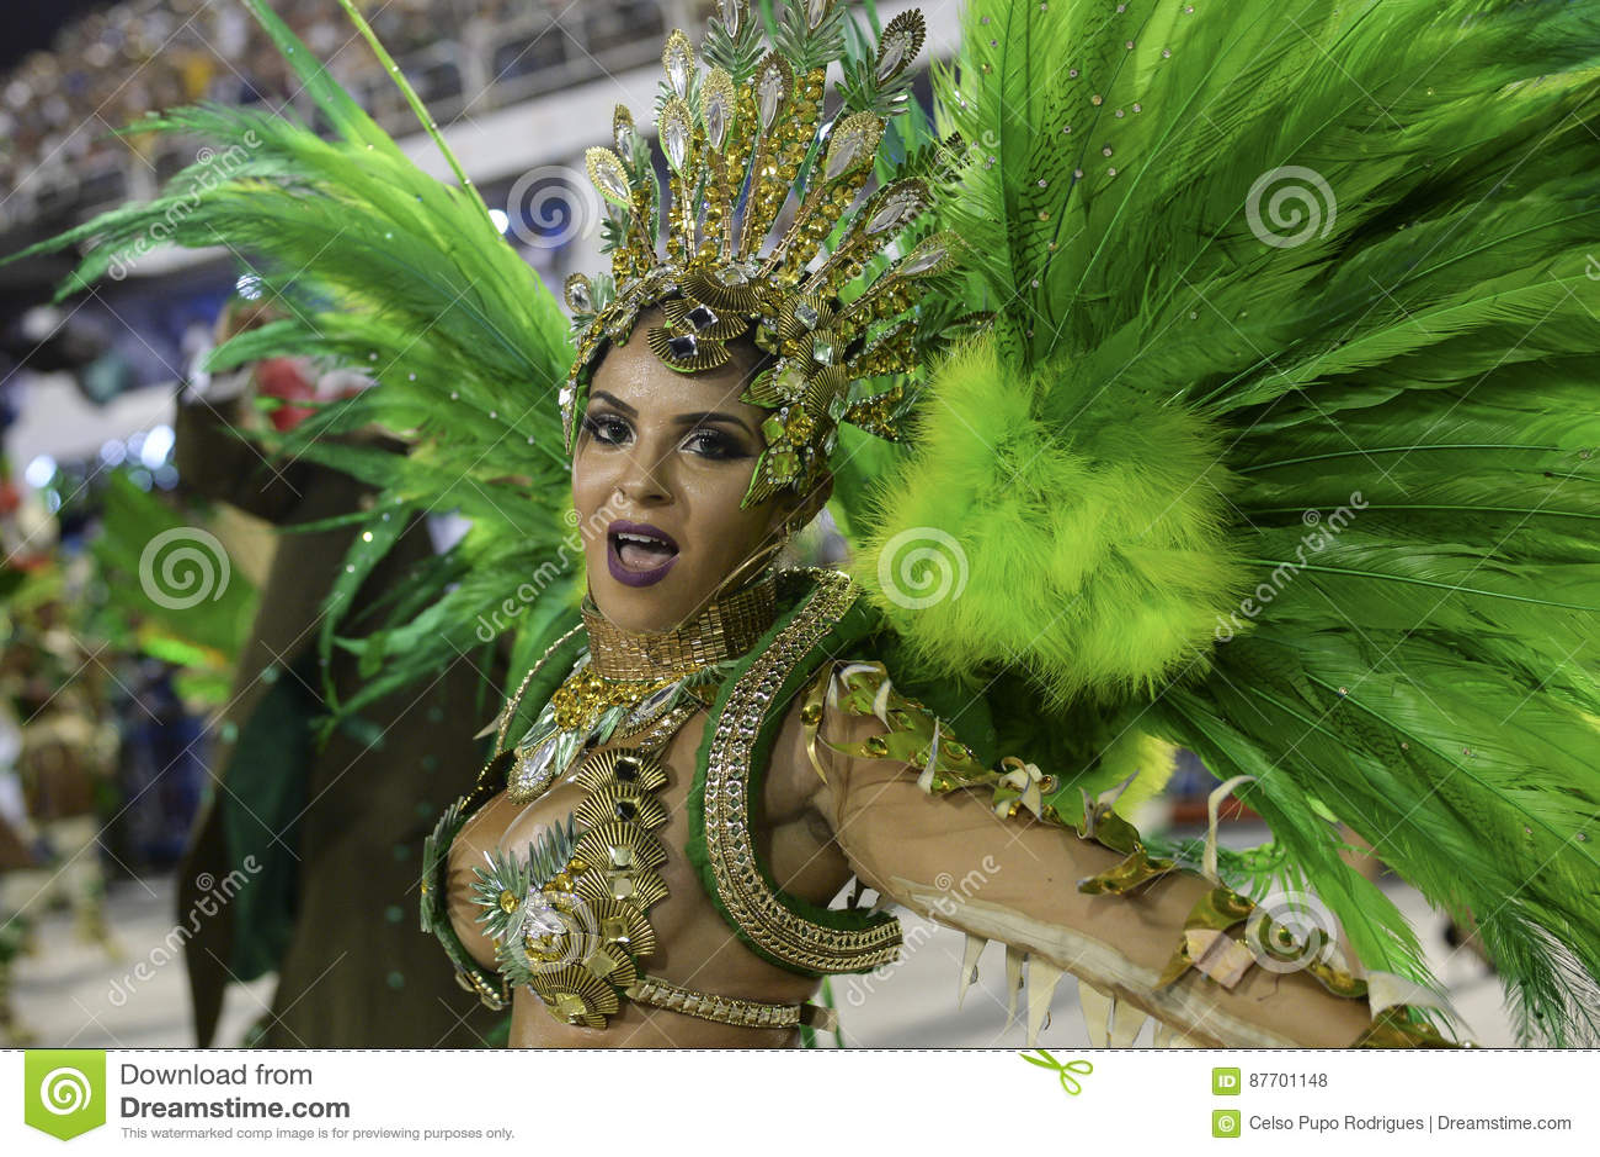 Carnaval 2017 - Imperio Serrano